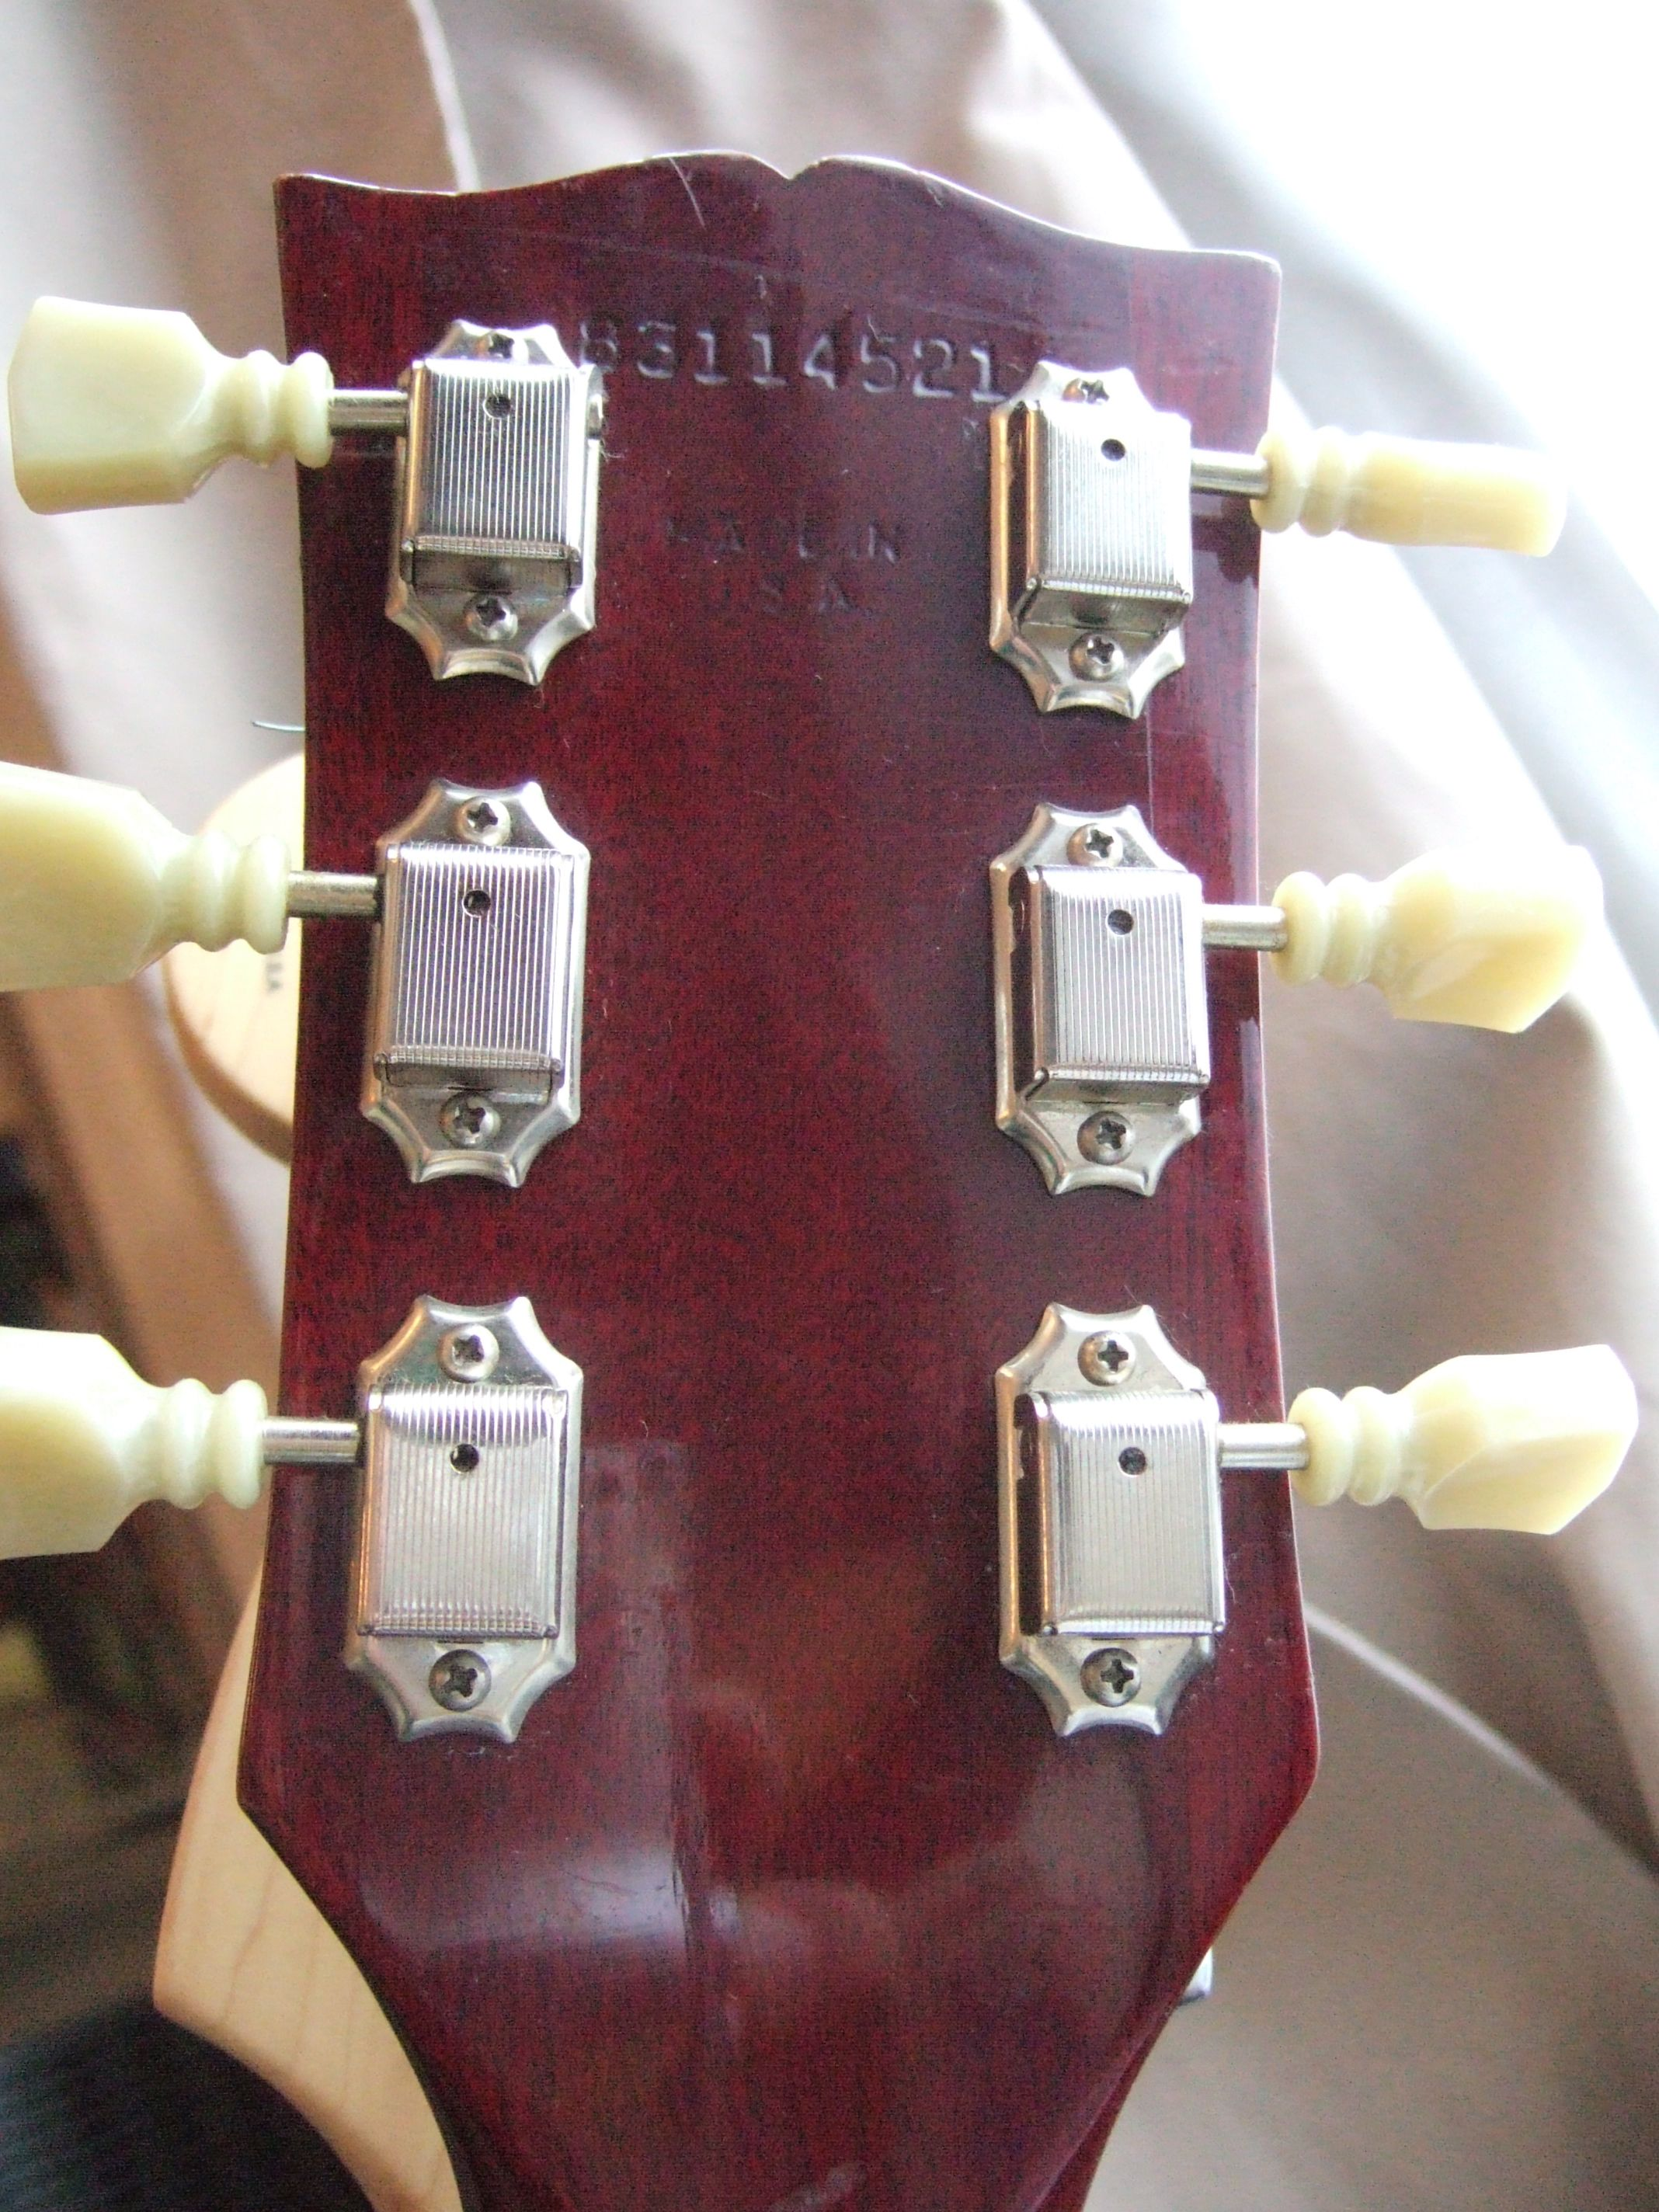 File:Gibson SG Standard (1984) serial number 83114521 jpg